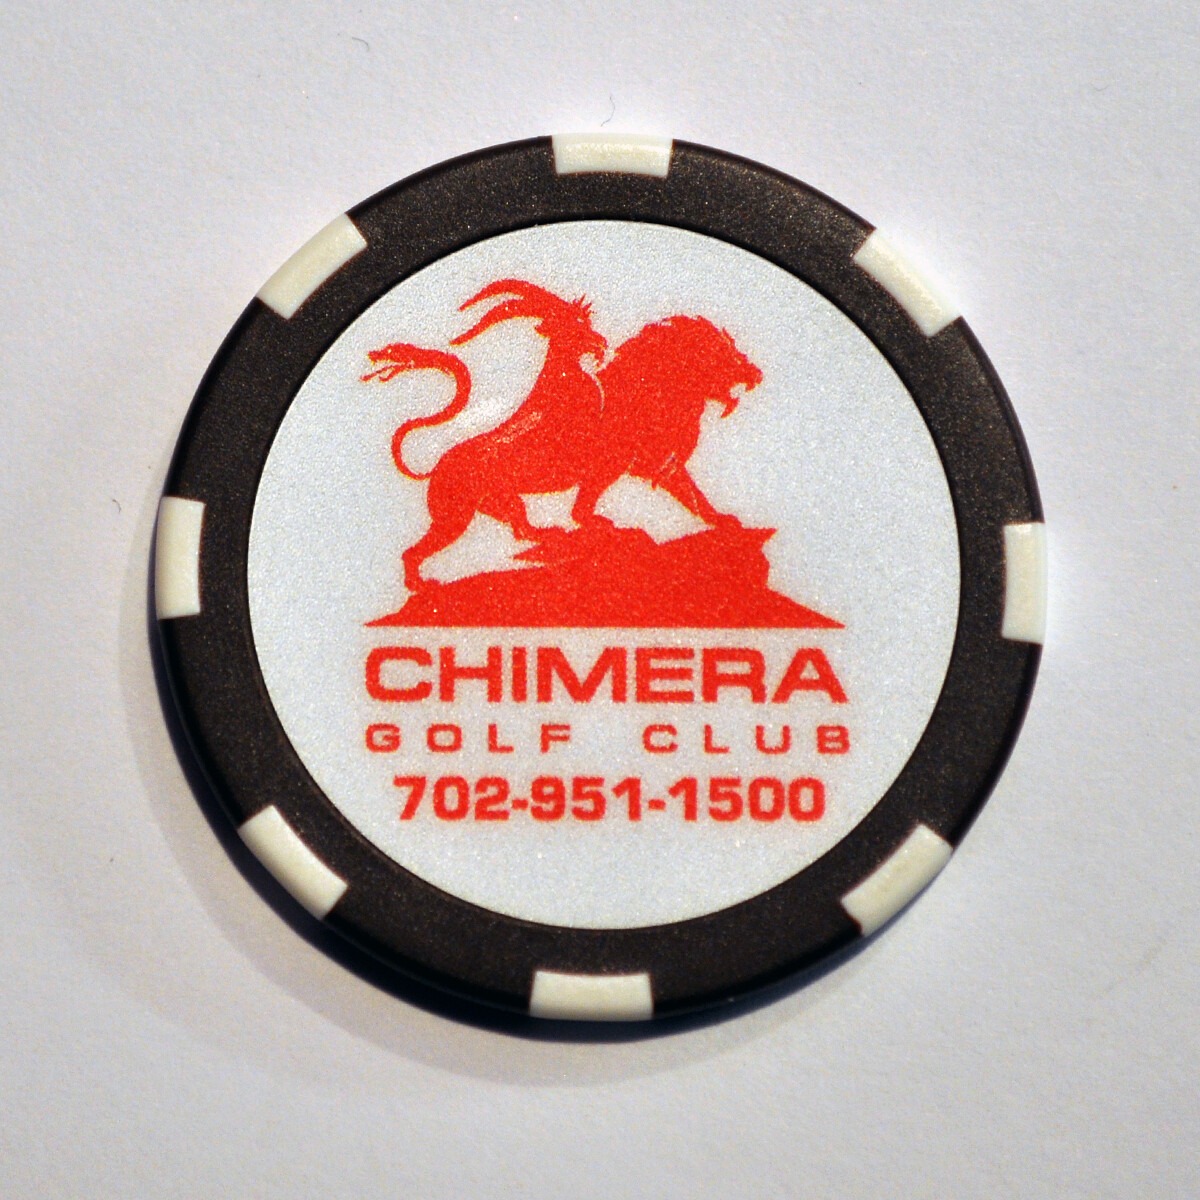 Poker Chip - Chimera - Brown/White